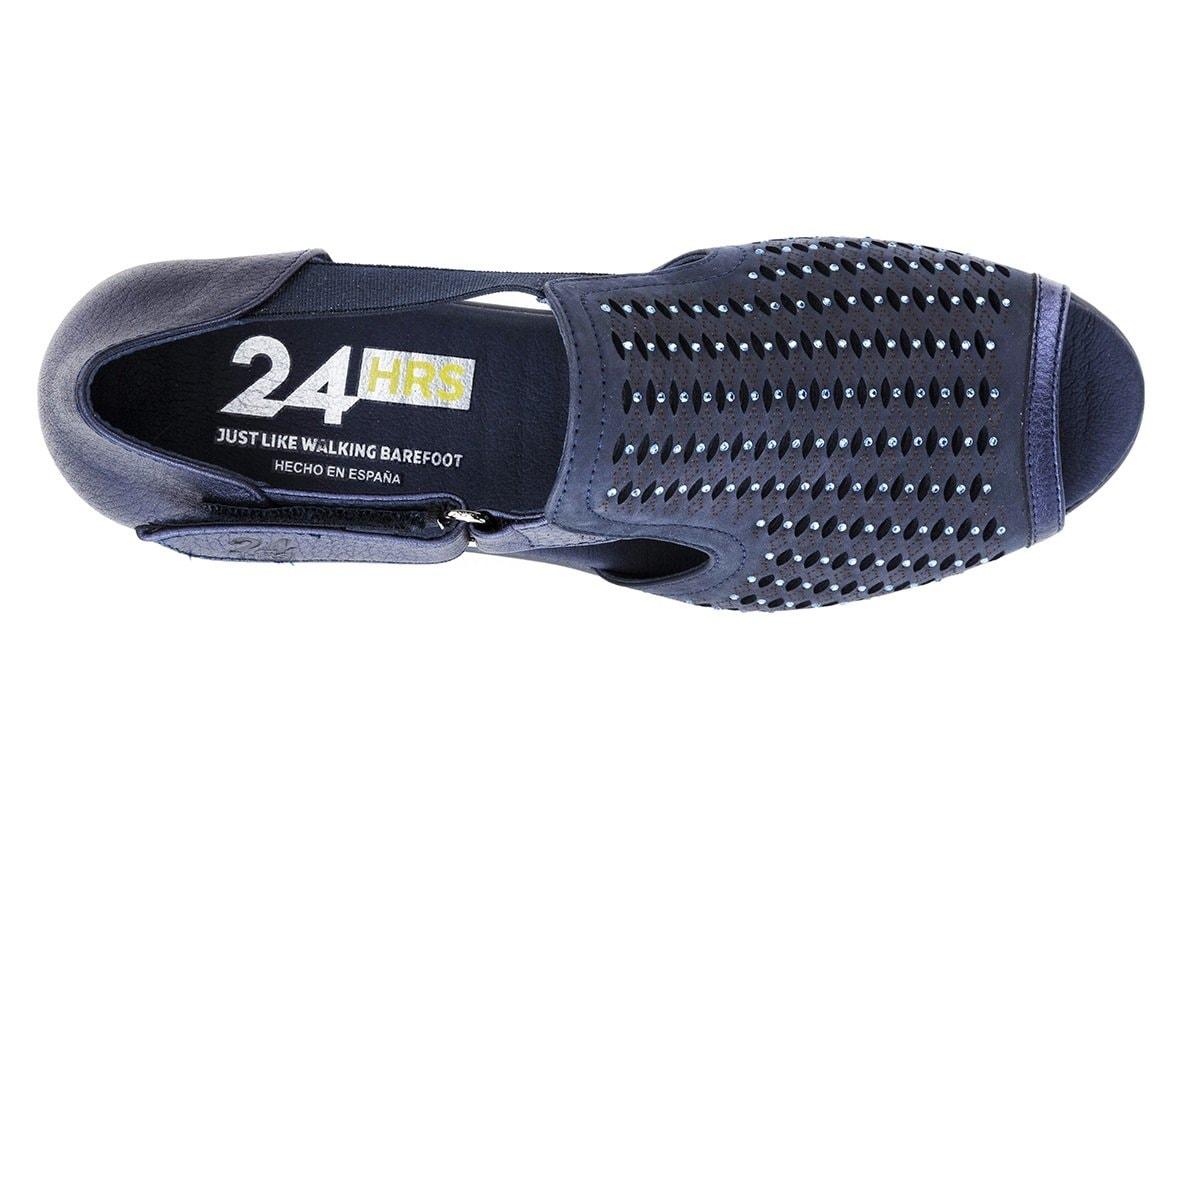 Velcro Con Sandalia Hrs Perforado 24 IeWDH9YE2b